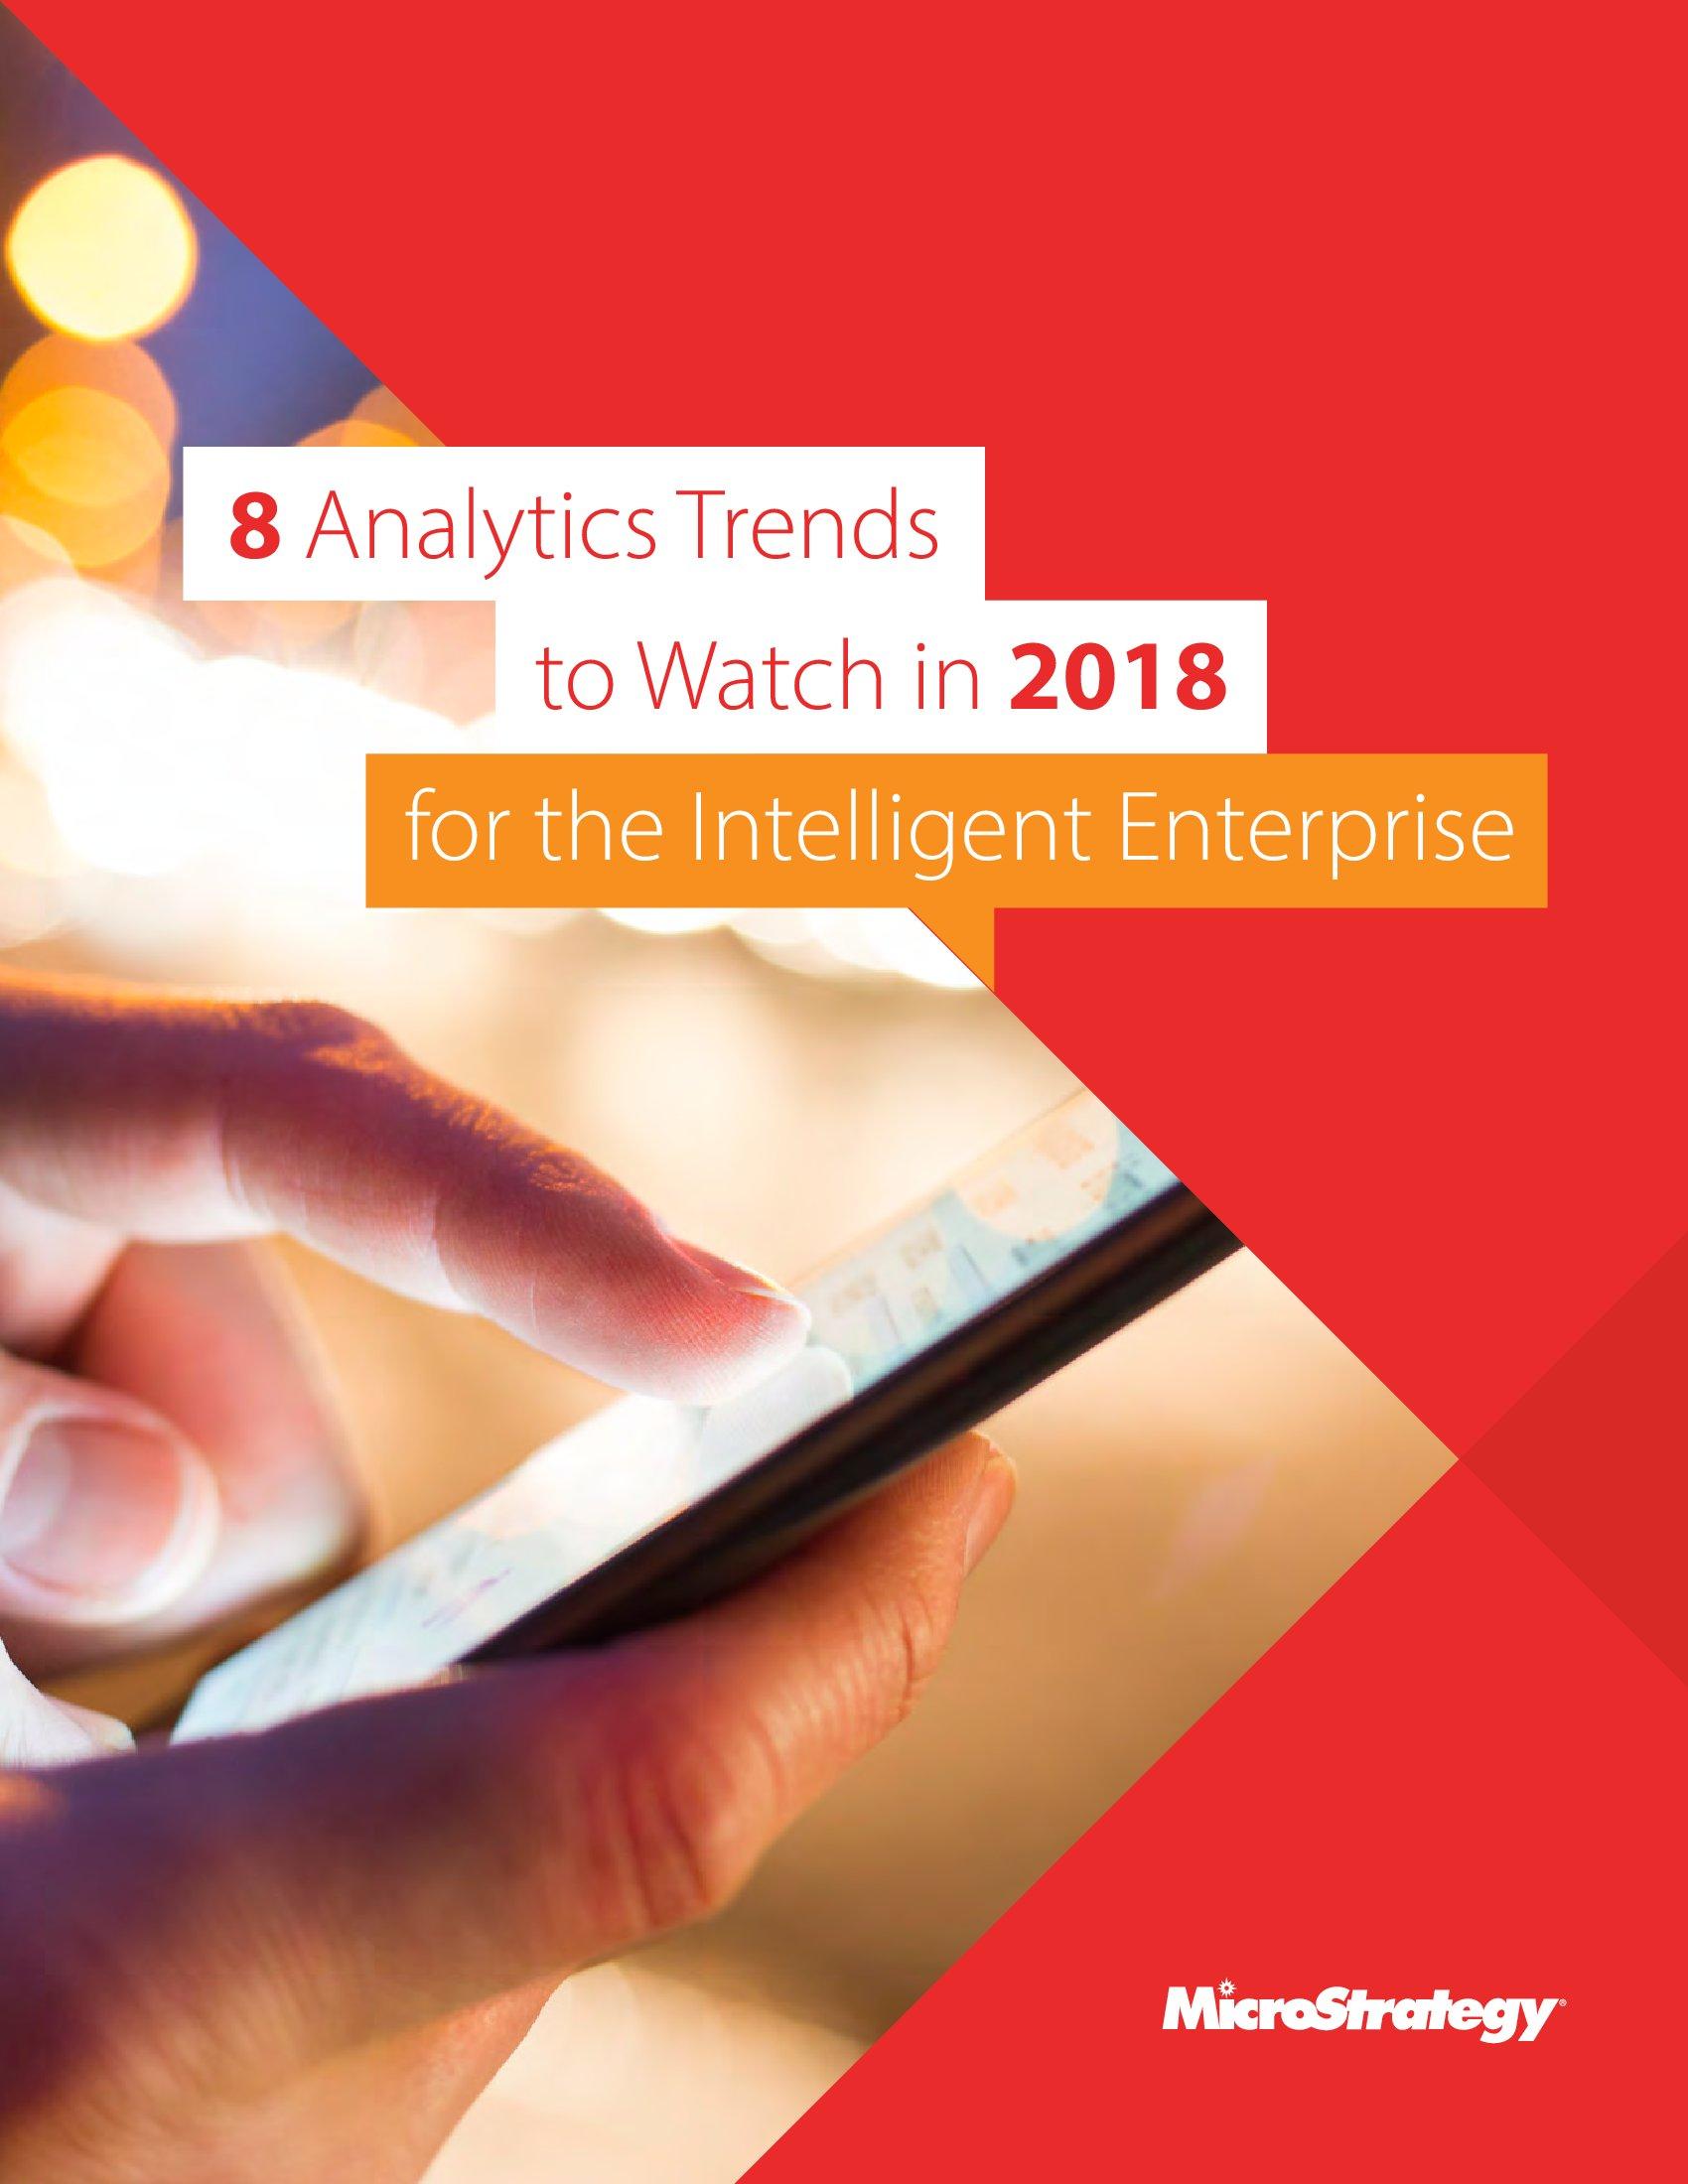 MicroStrategy:2018年智能企业应当关注的八大分析趋势